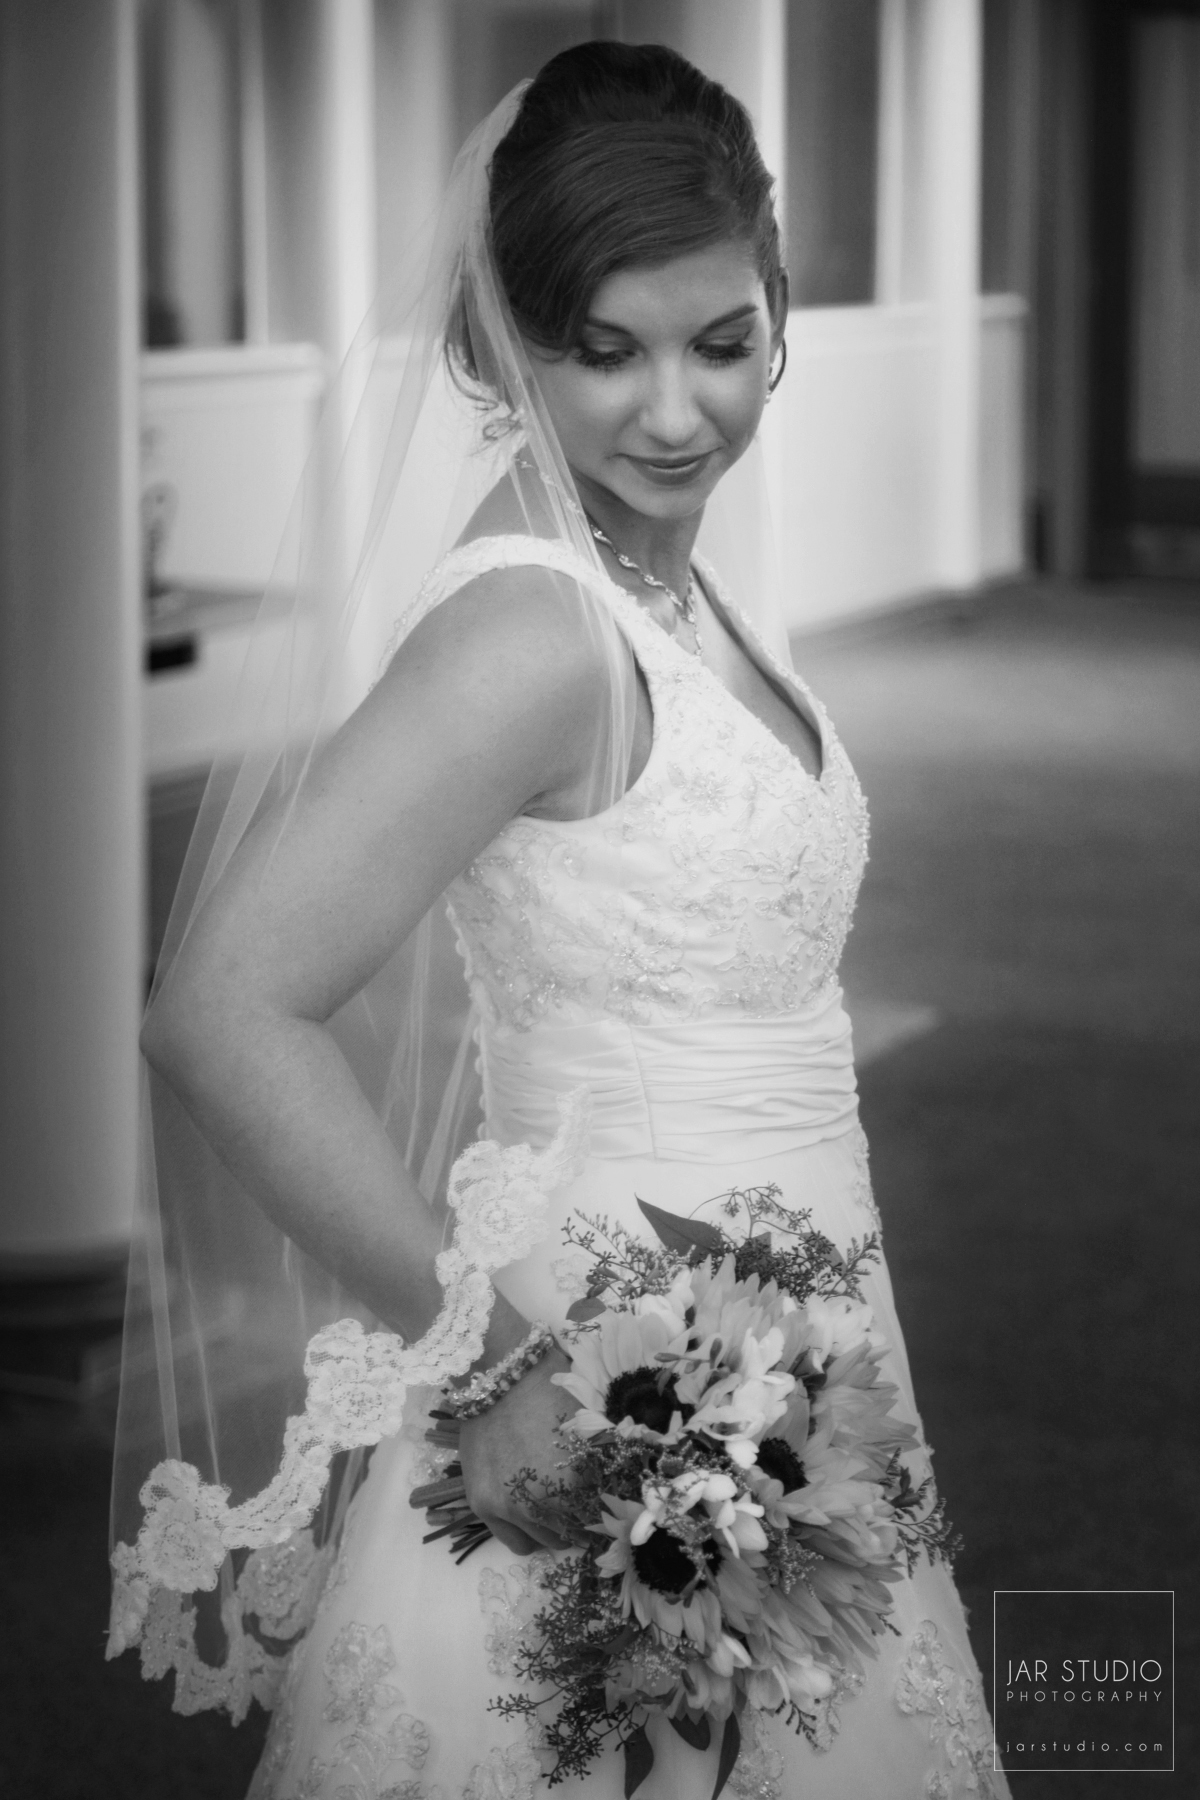 08-bride-sunflowers-bouquet-jarstudio-photography.JPG